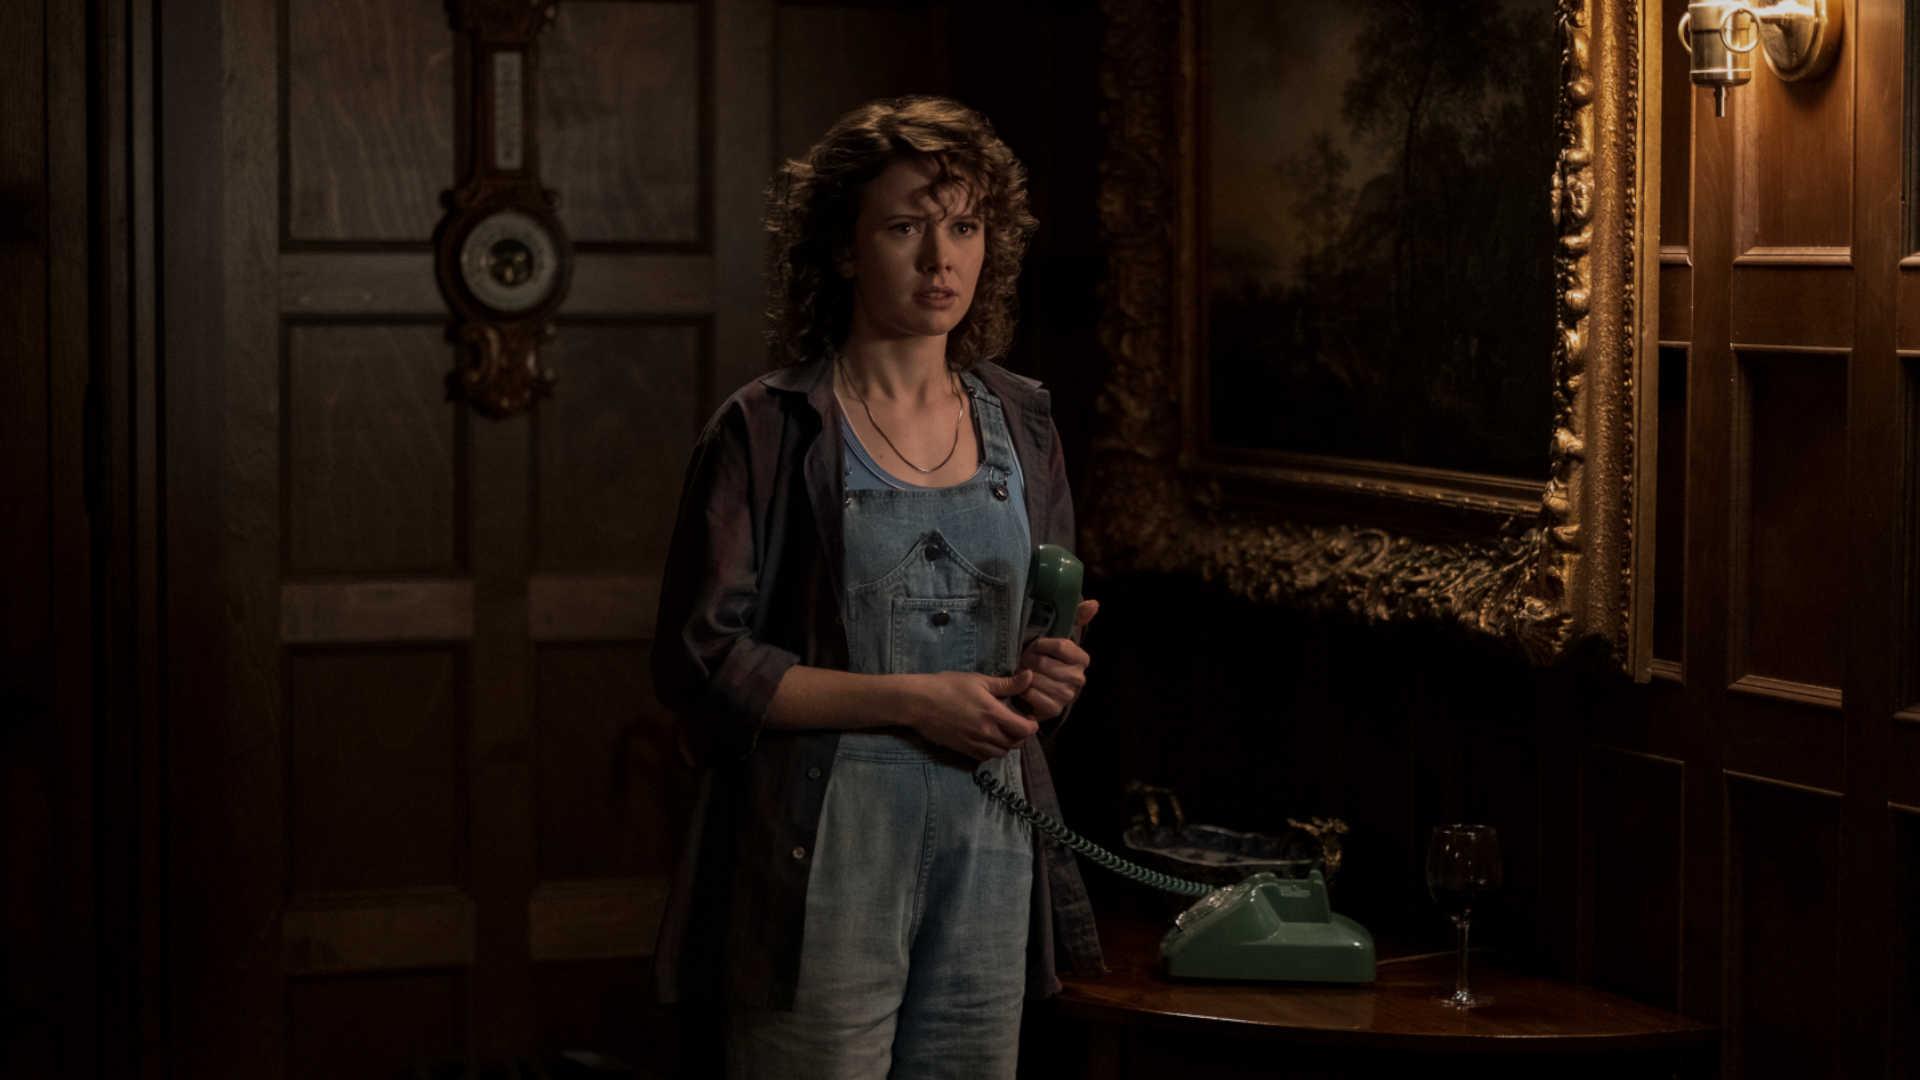 Amelia Eve als die junge Jamie in Netflix' Spuk in Bly Manor